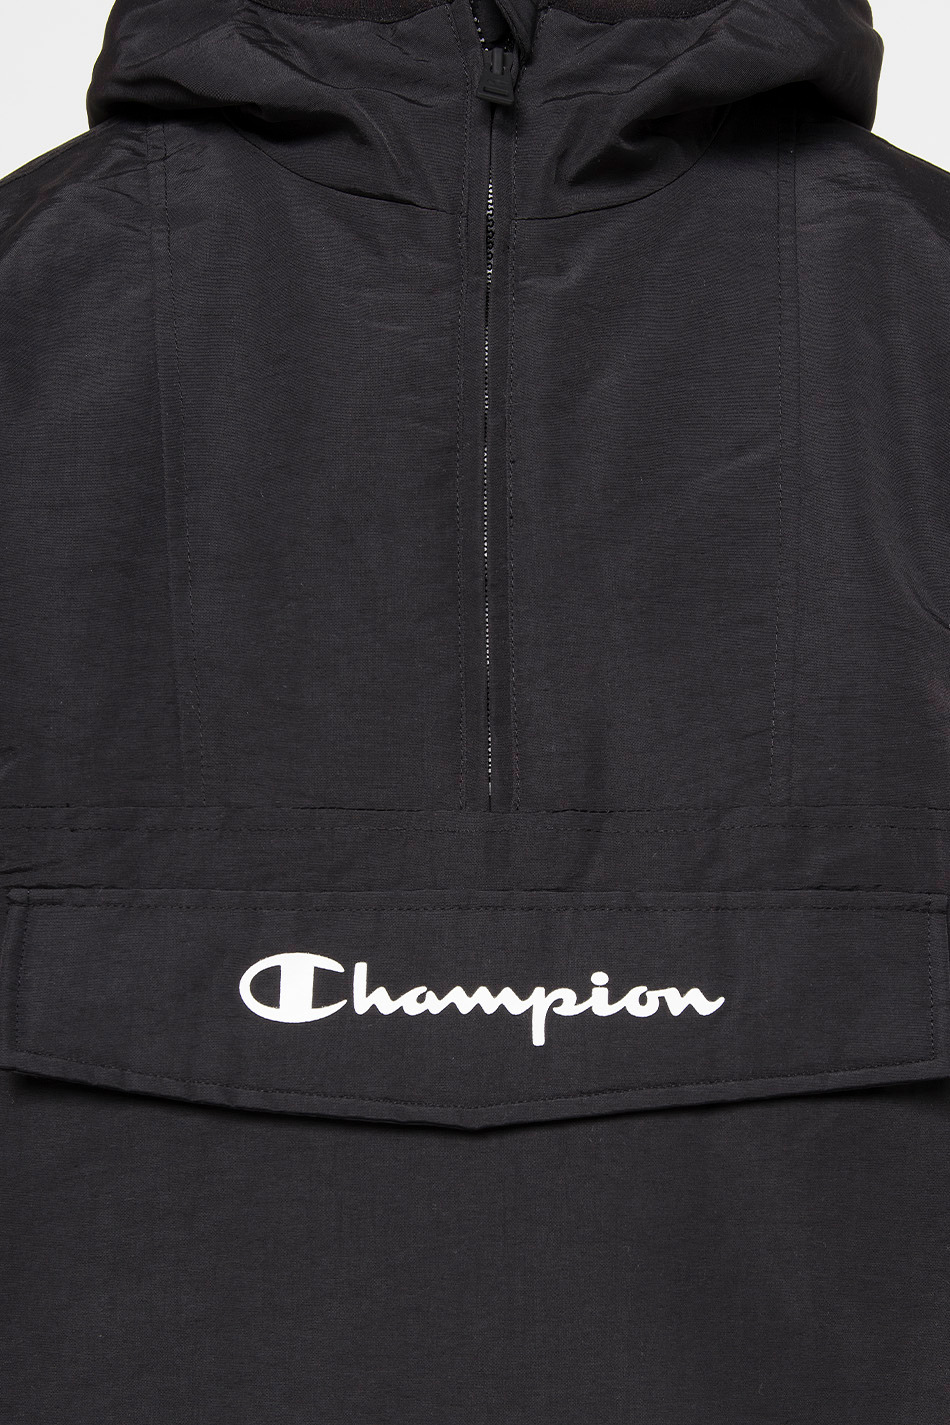 Champion Outdoor Jacket